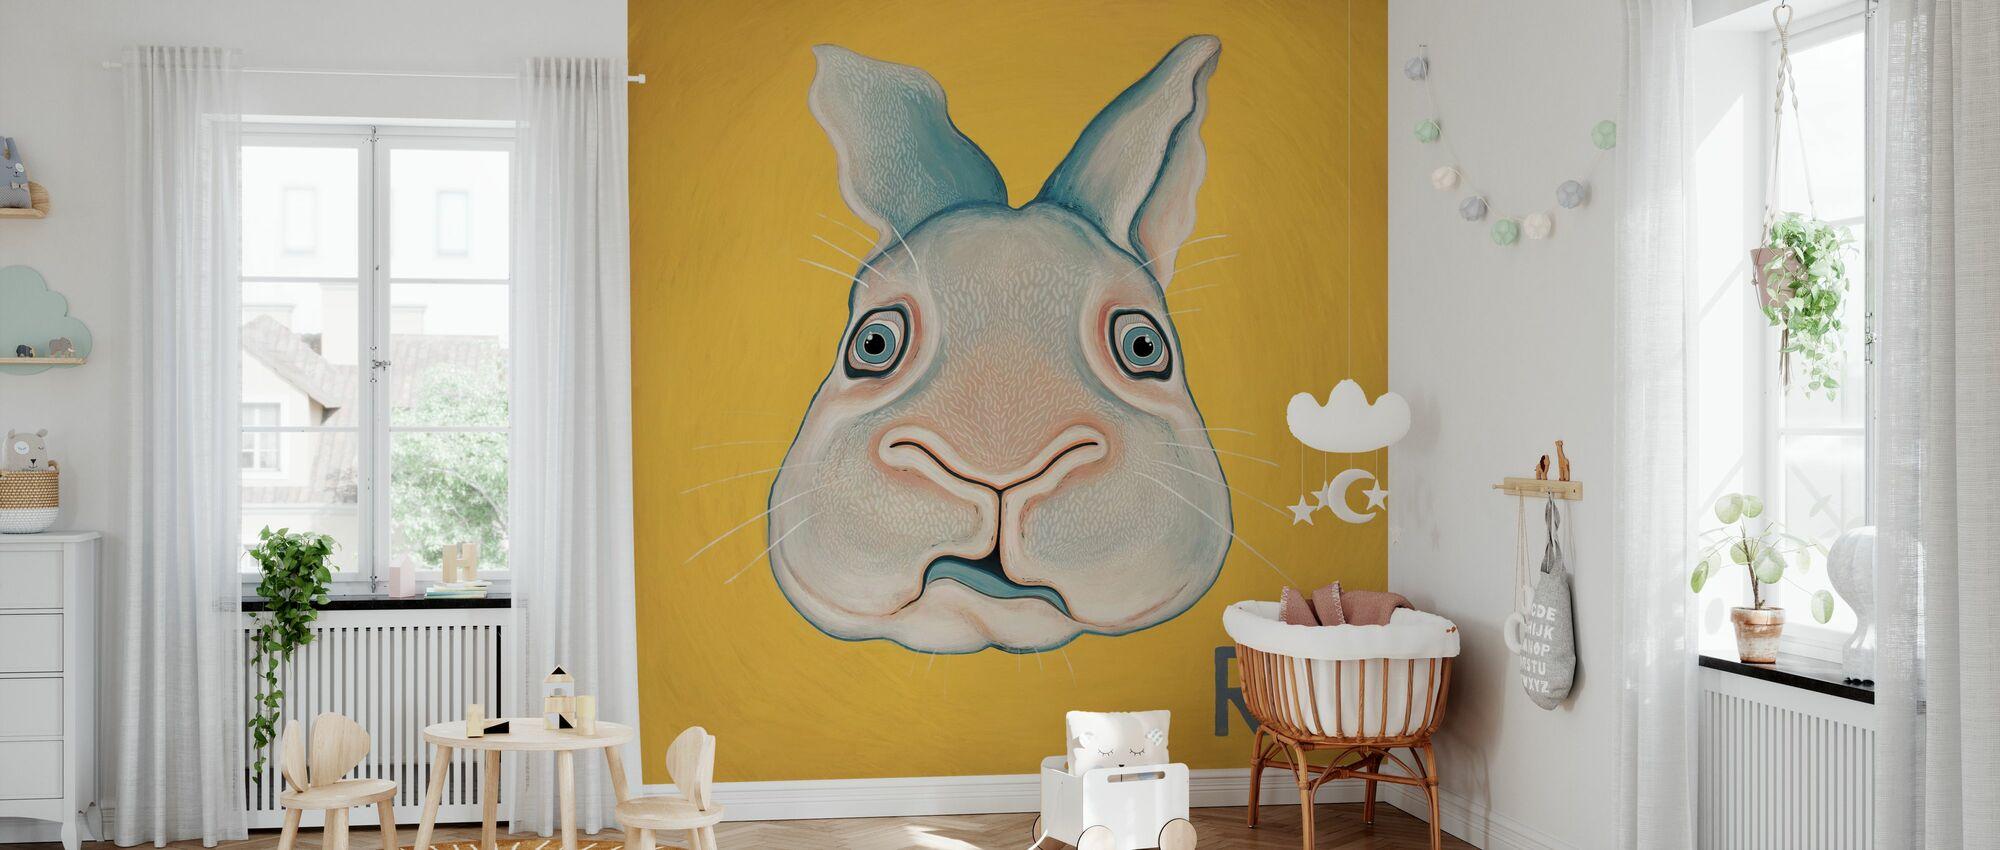 Rabbit with R - Wallpaper - Nursery